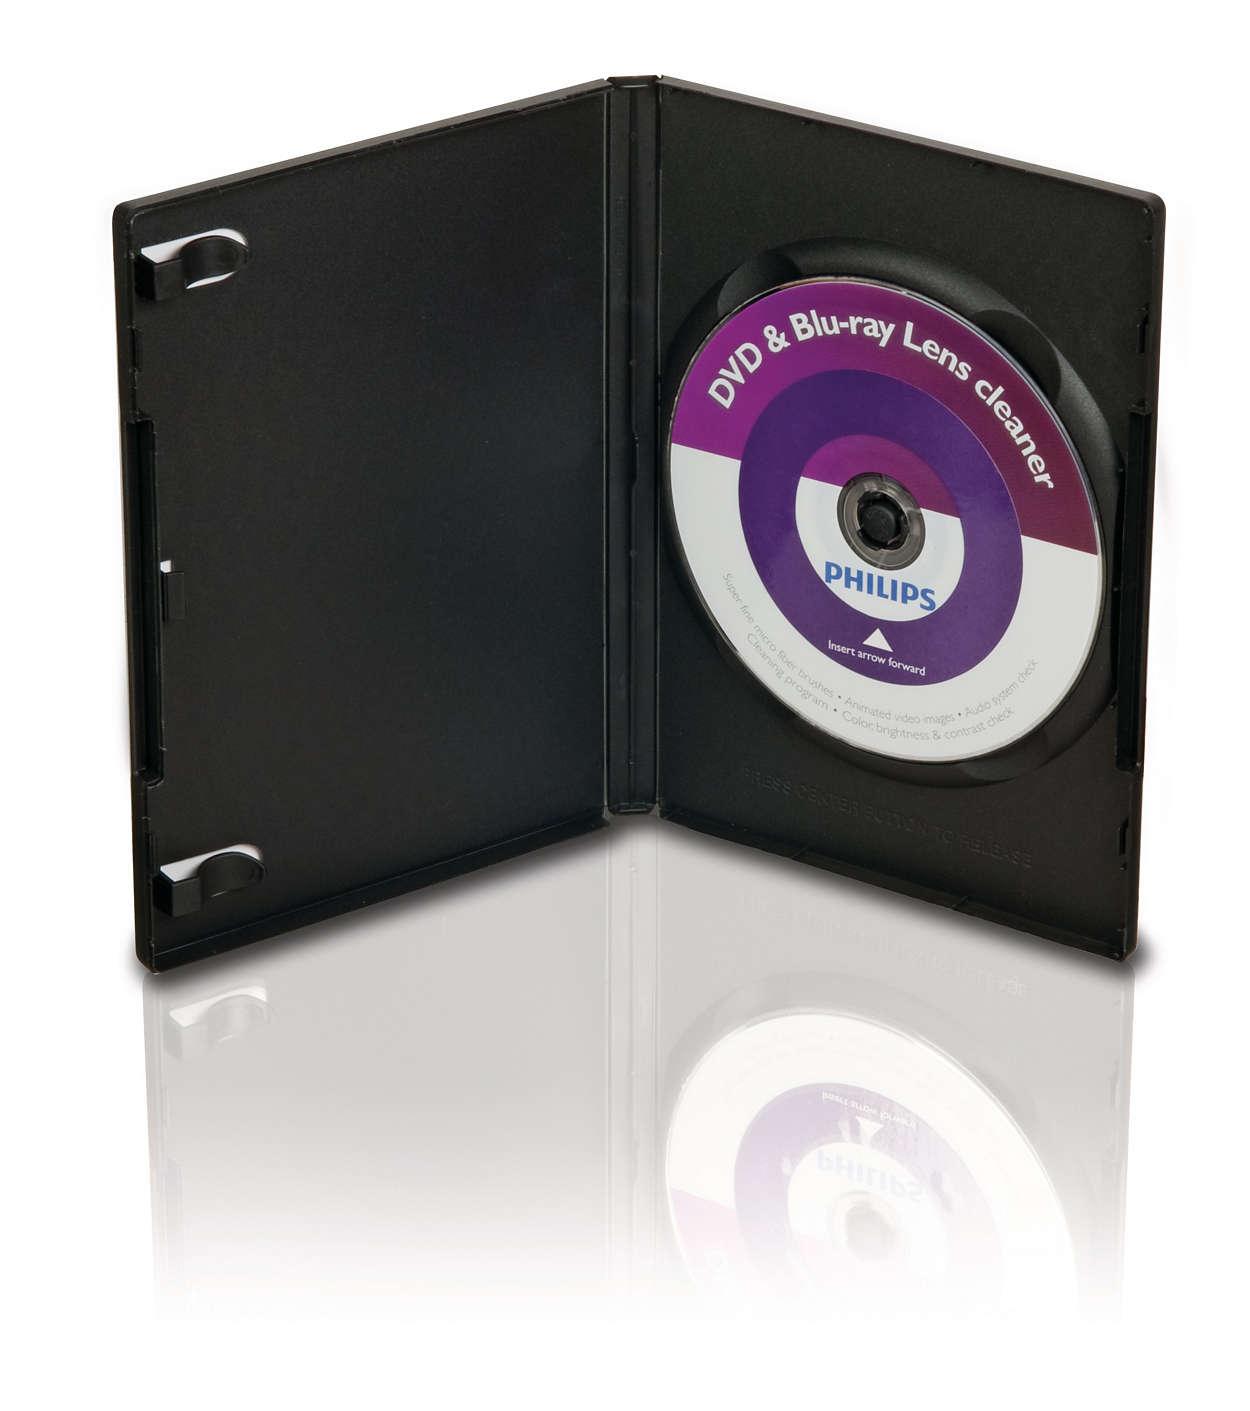 Reinigt en beschermt DVD- en Blu ray-spelers